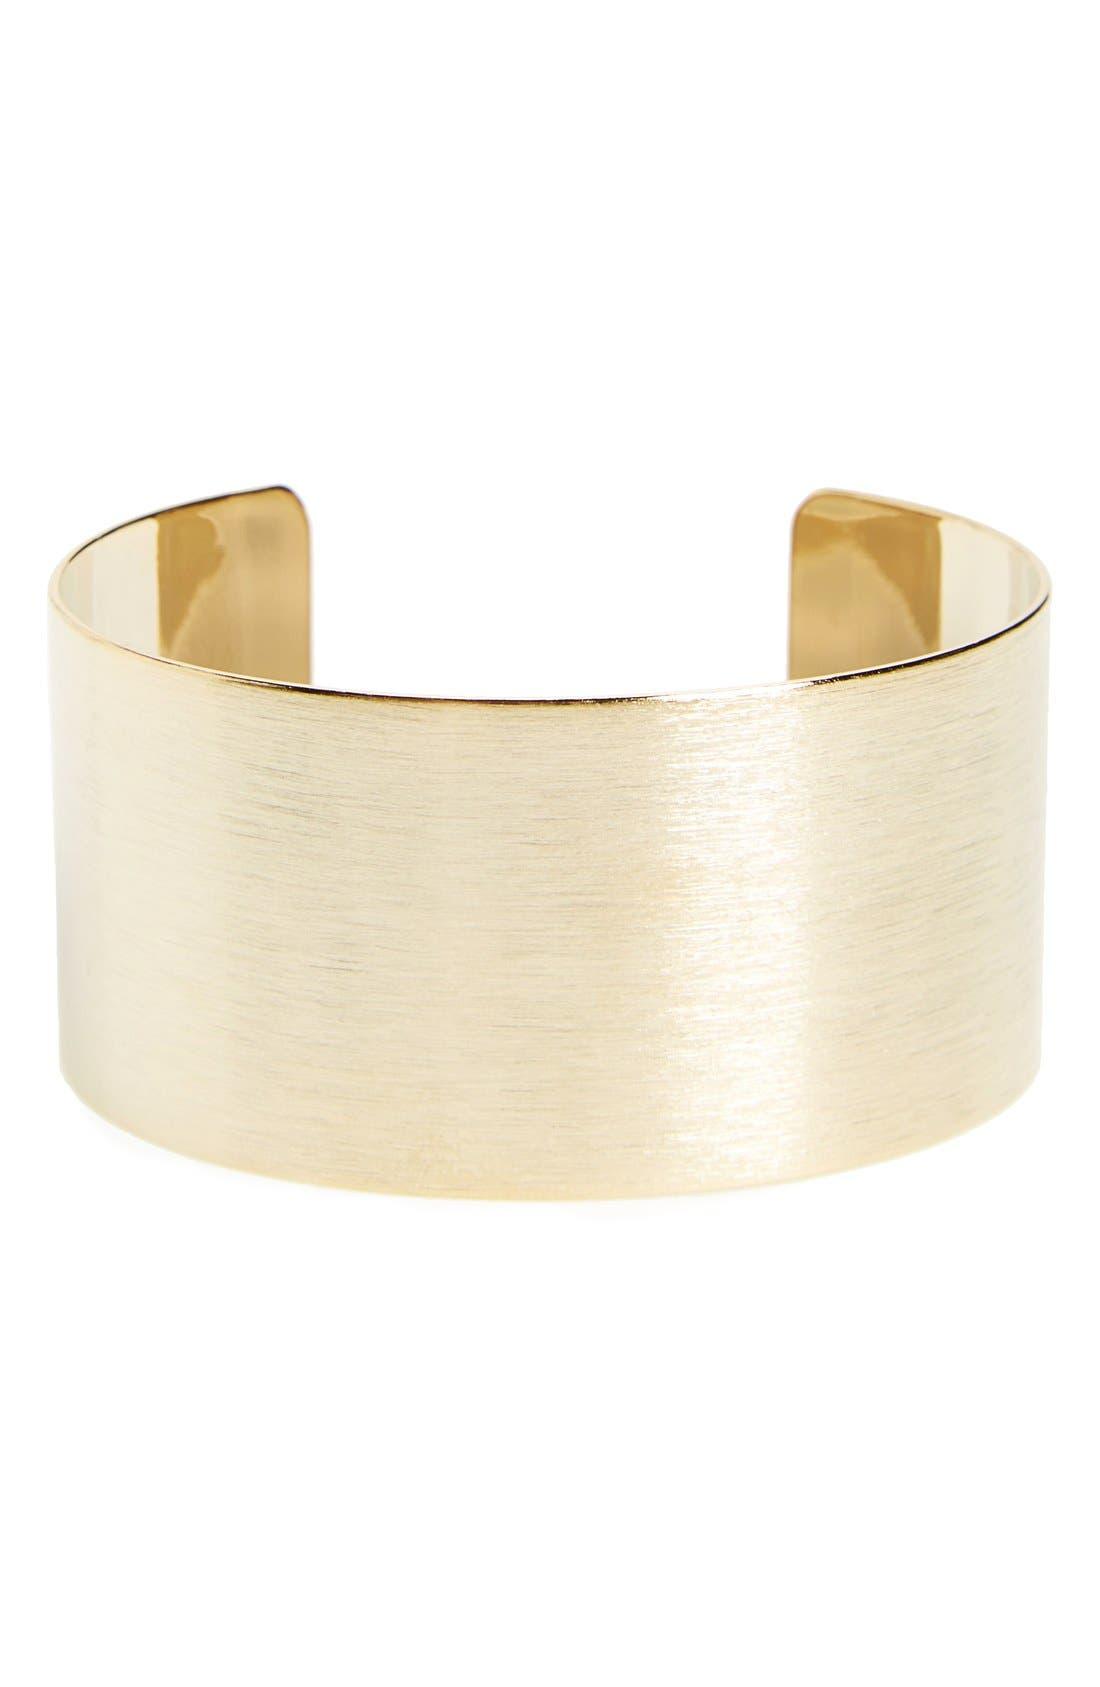 Alternate Image 1 Selected - Panacea Brushed Cuff Bracelet